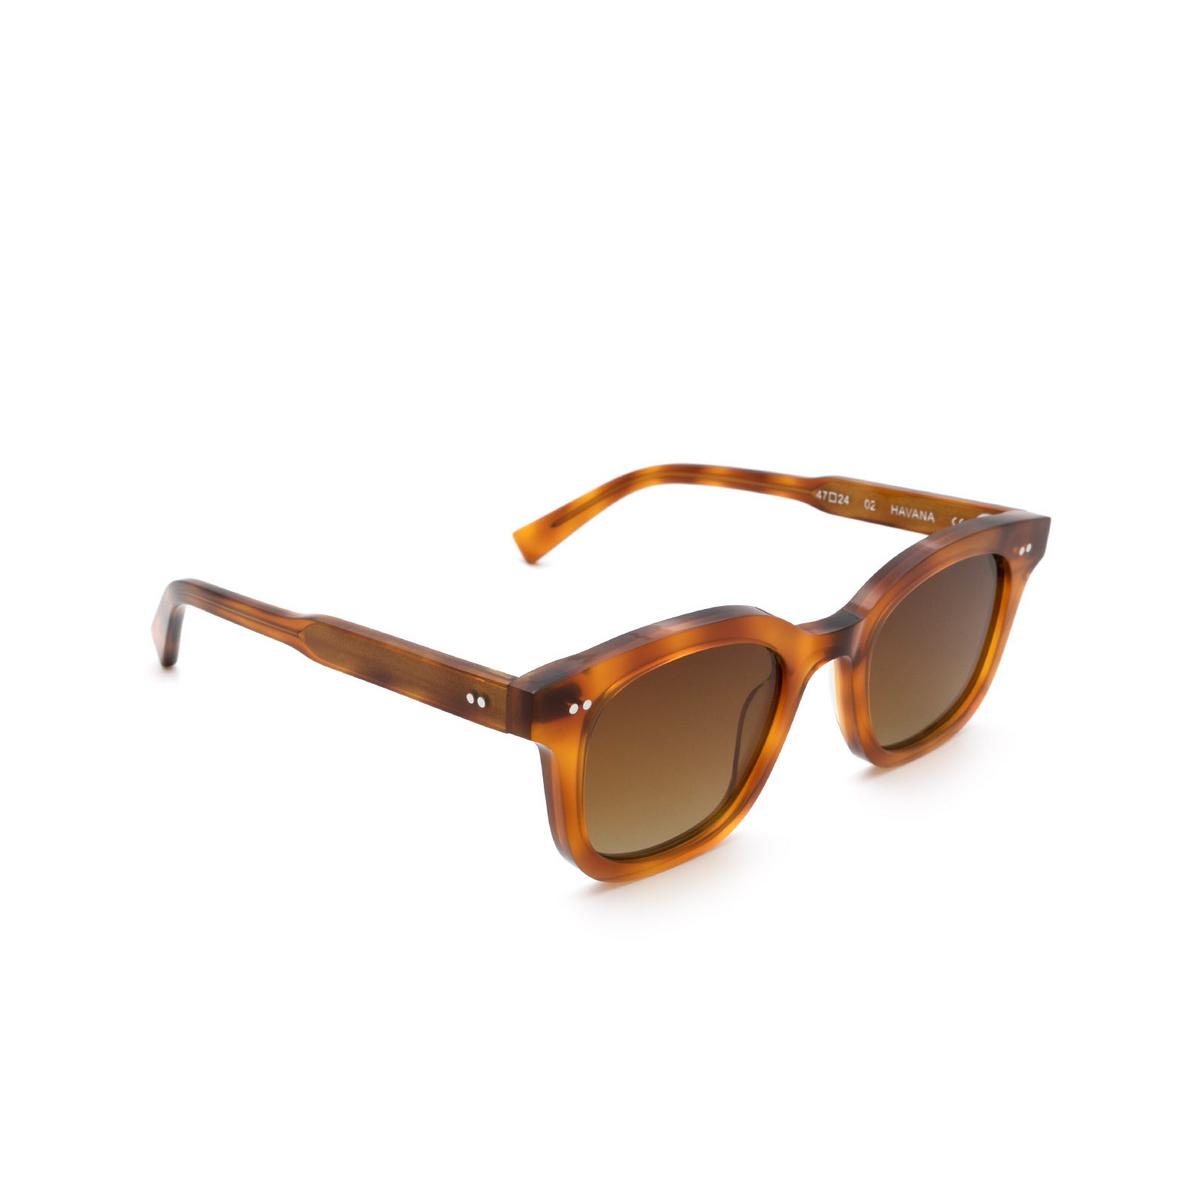 Chimi® Square Sunglasses: 02 color Havana - three-quarters view.